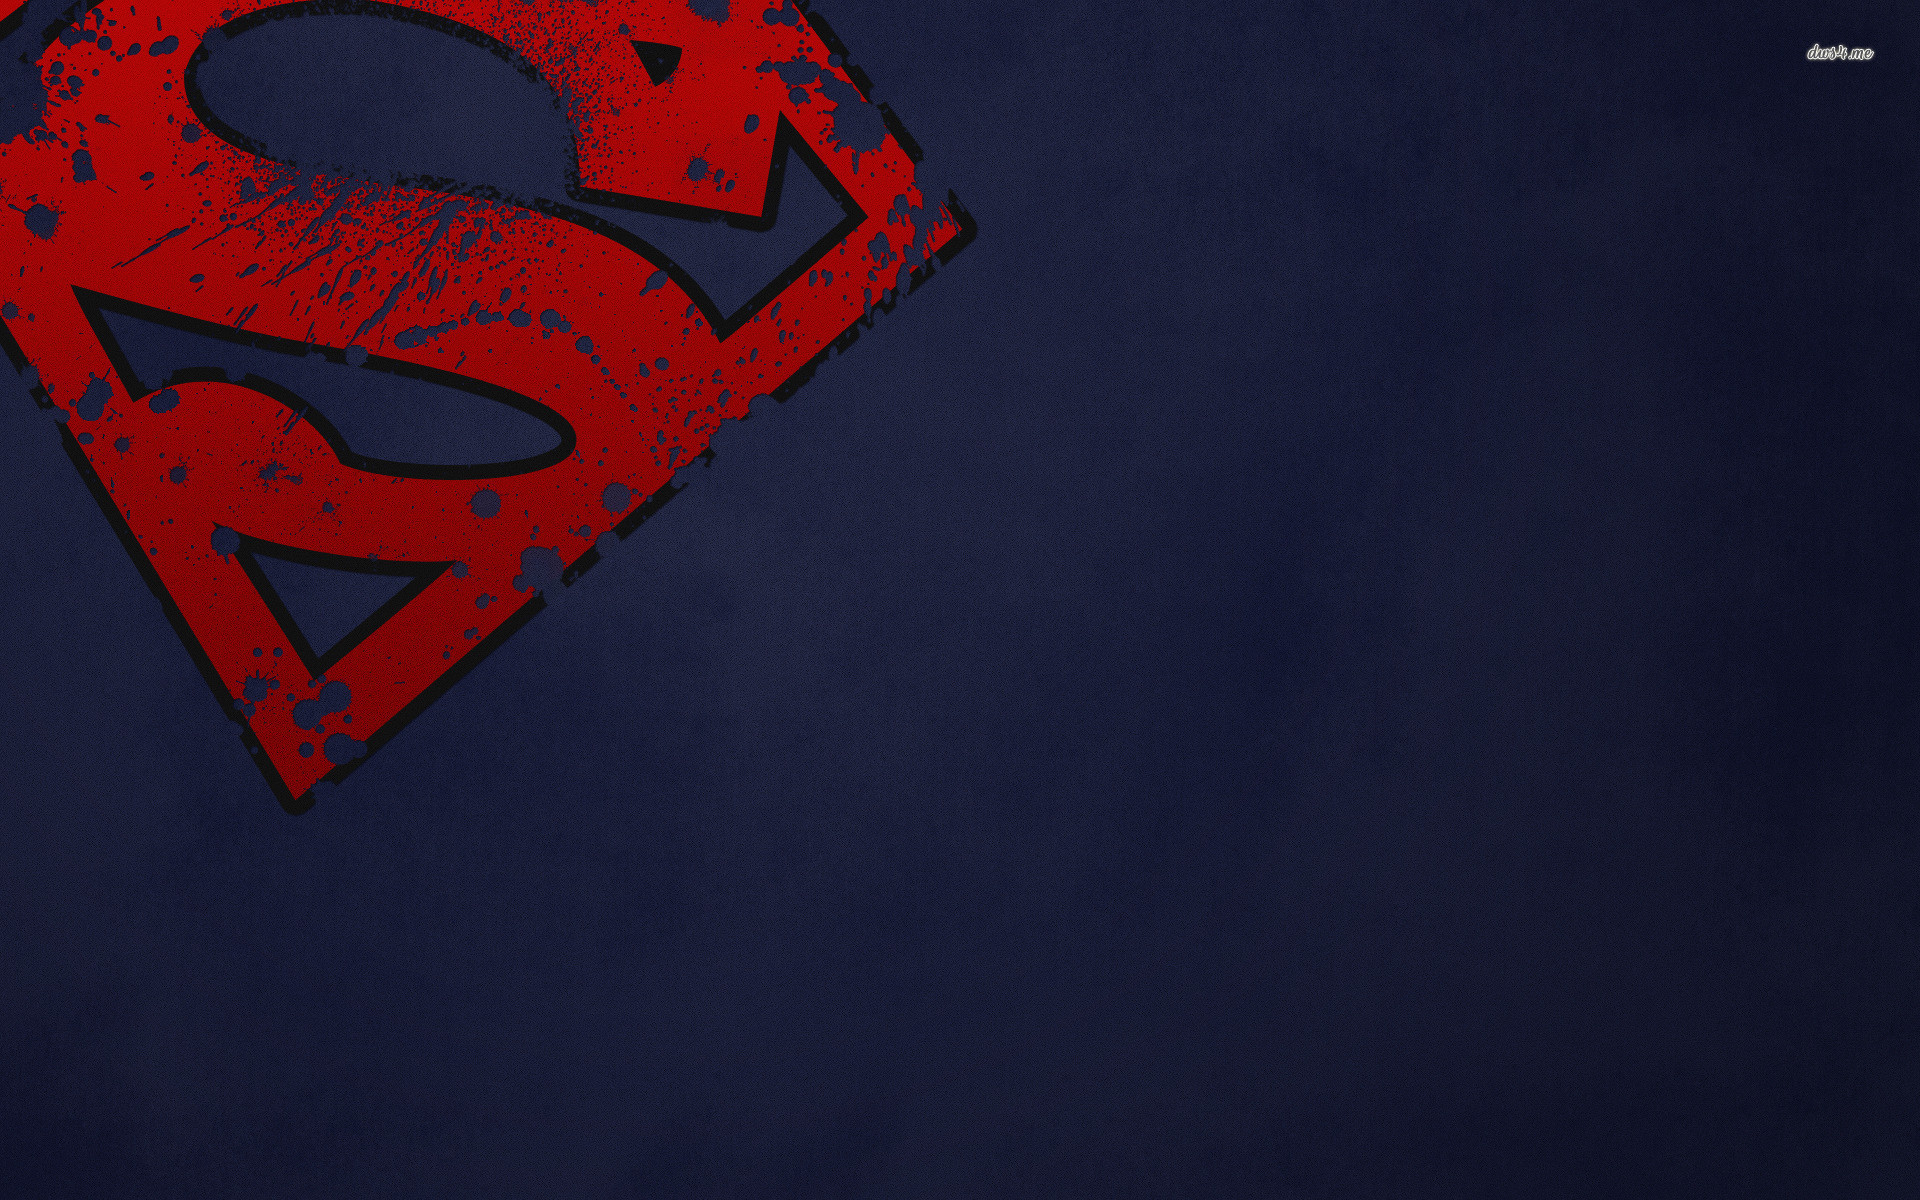 Download Superman Logo Wallpaper Phone #49Vjd >